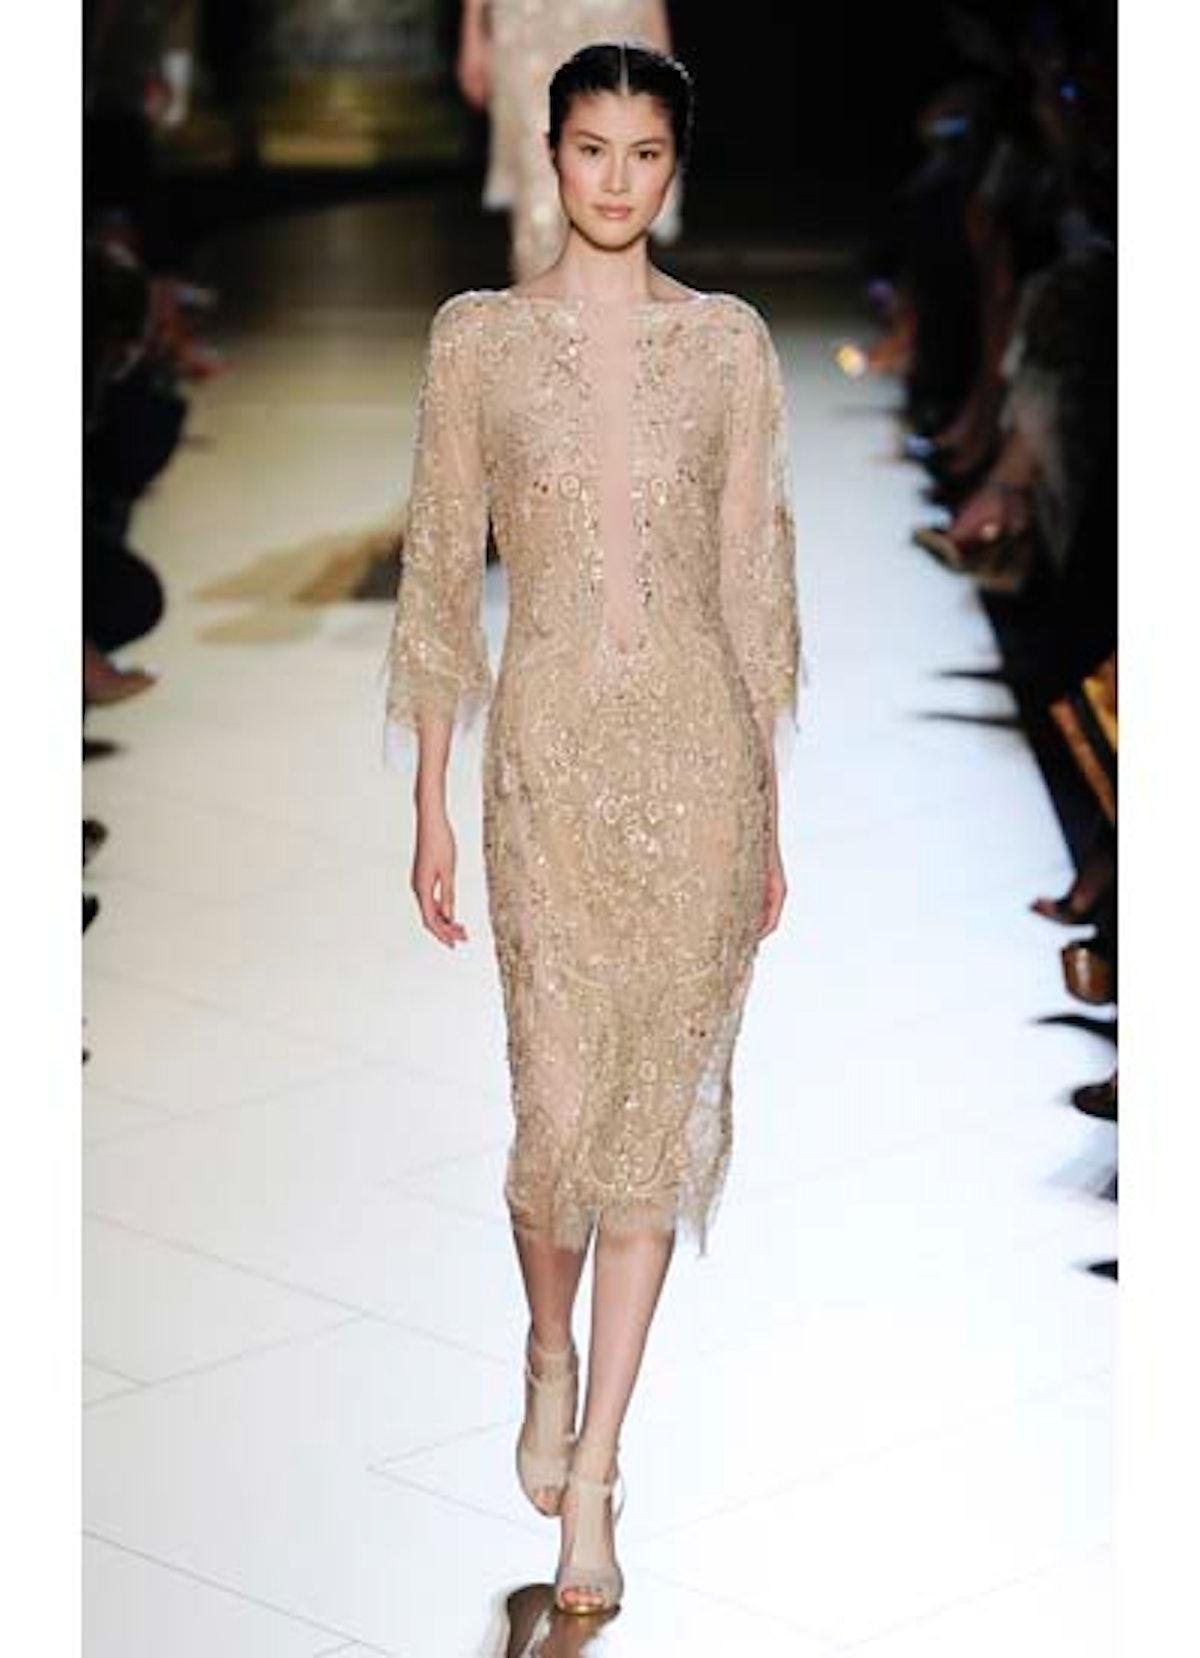 fass-elie-saab-couture-2012-runway-09-v.jpg